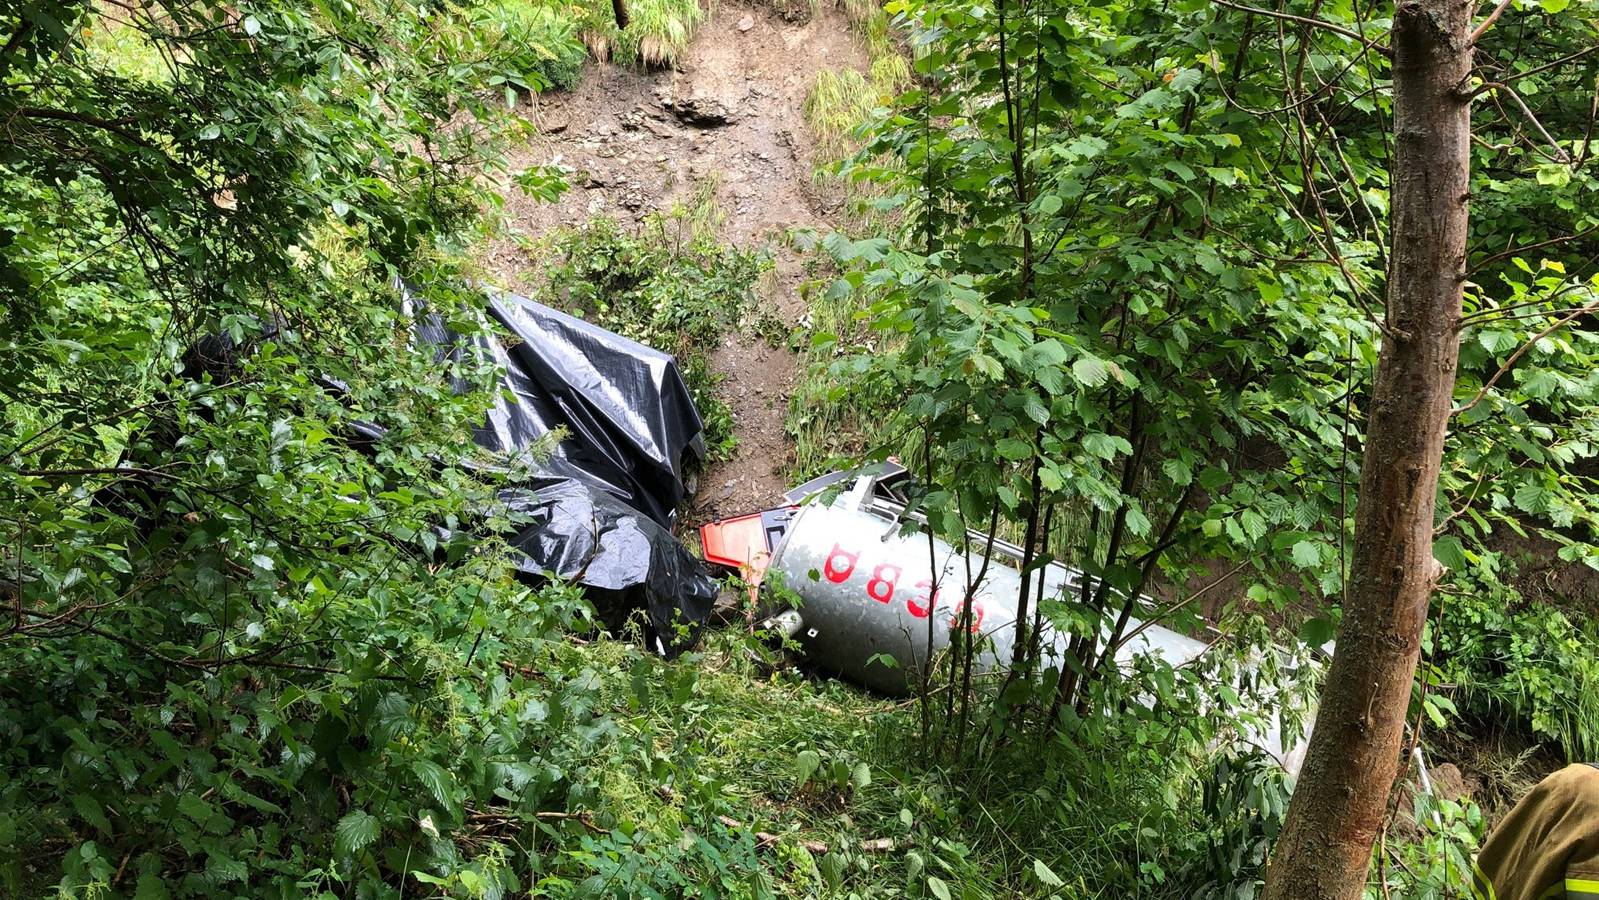 2020-07-15 Cumbel Unfall Motorkarren Gülle